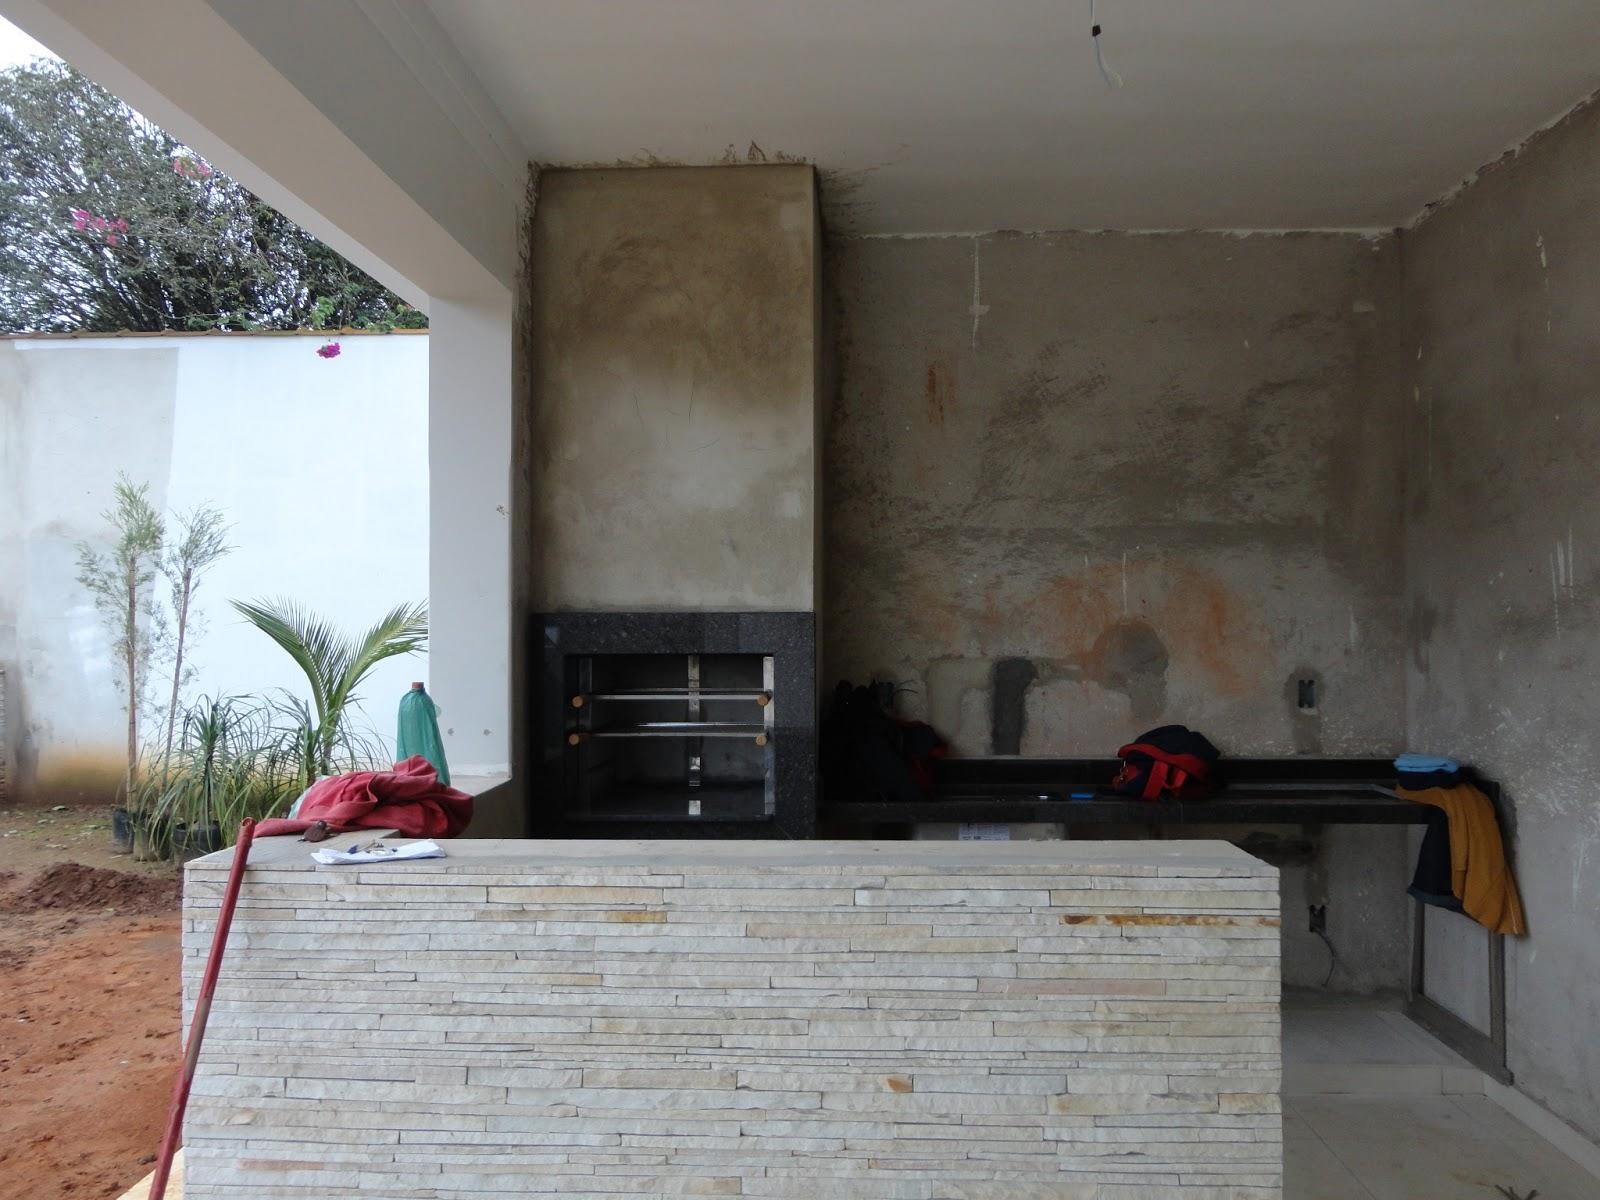 café imperial na bancada da pia e cook top e moldura da churrasqueira  #80574B 1600x1200